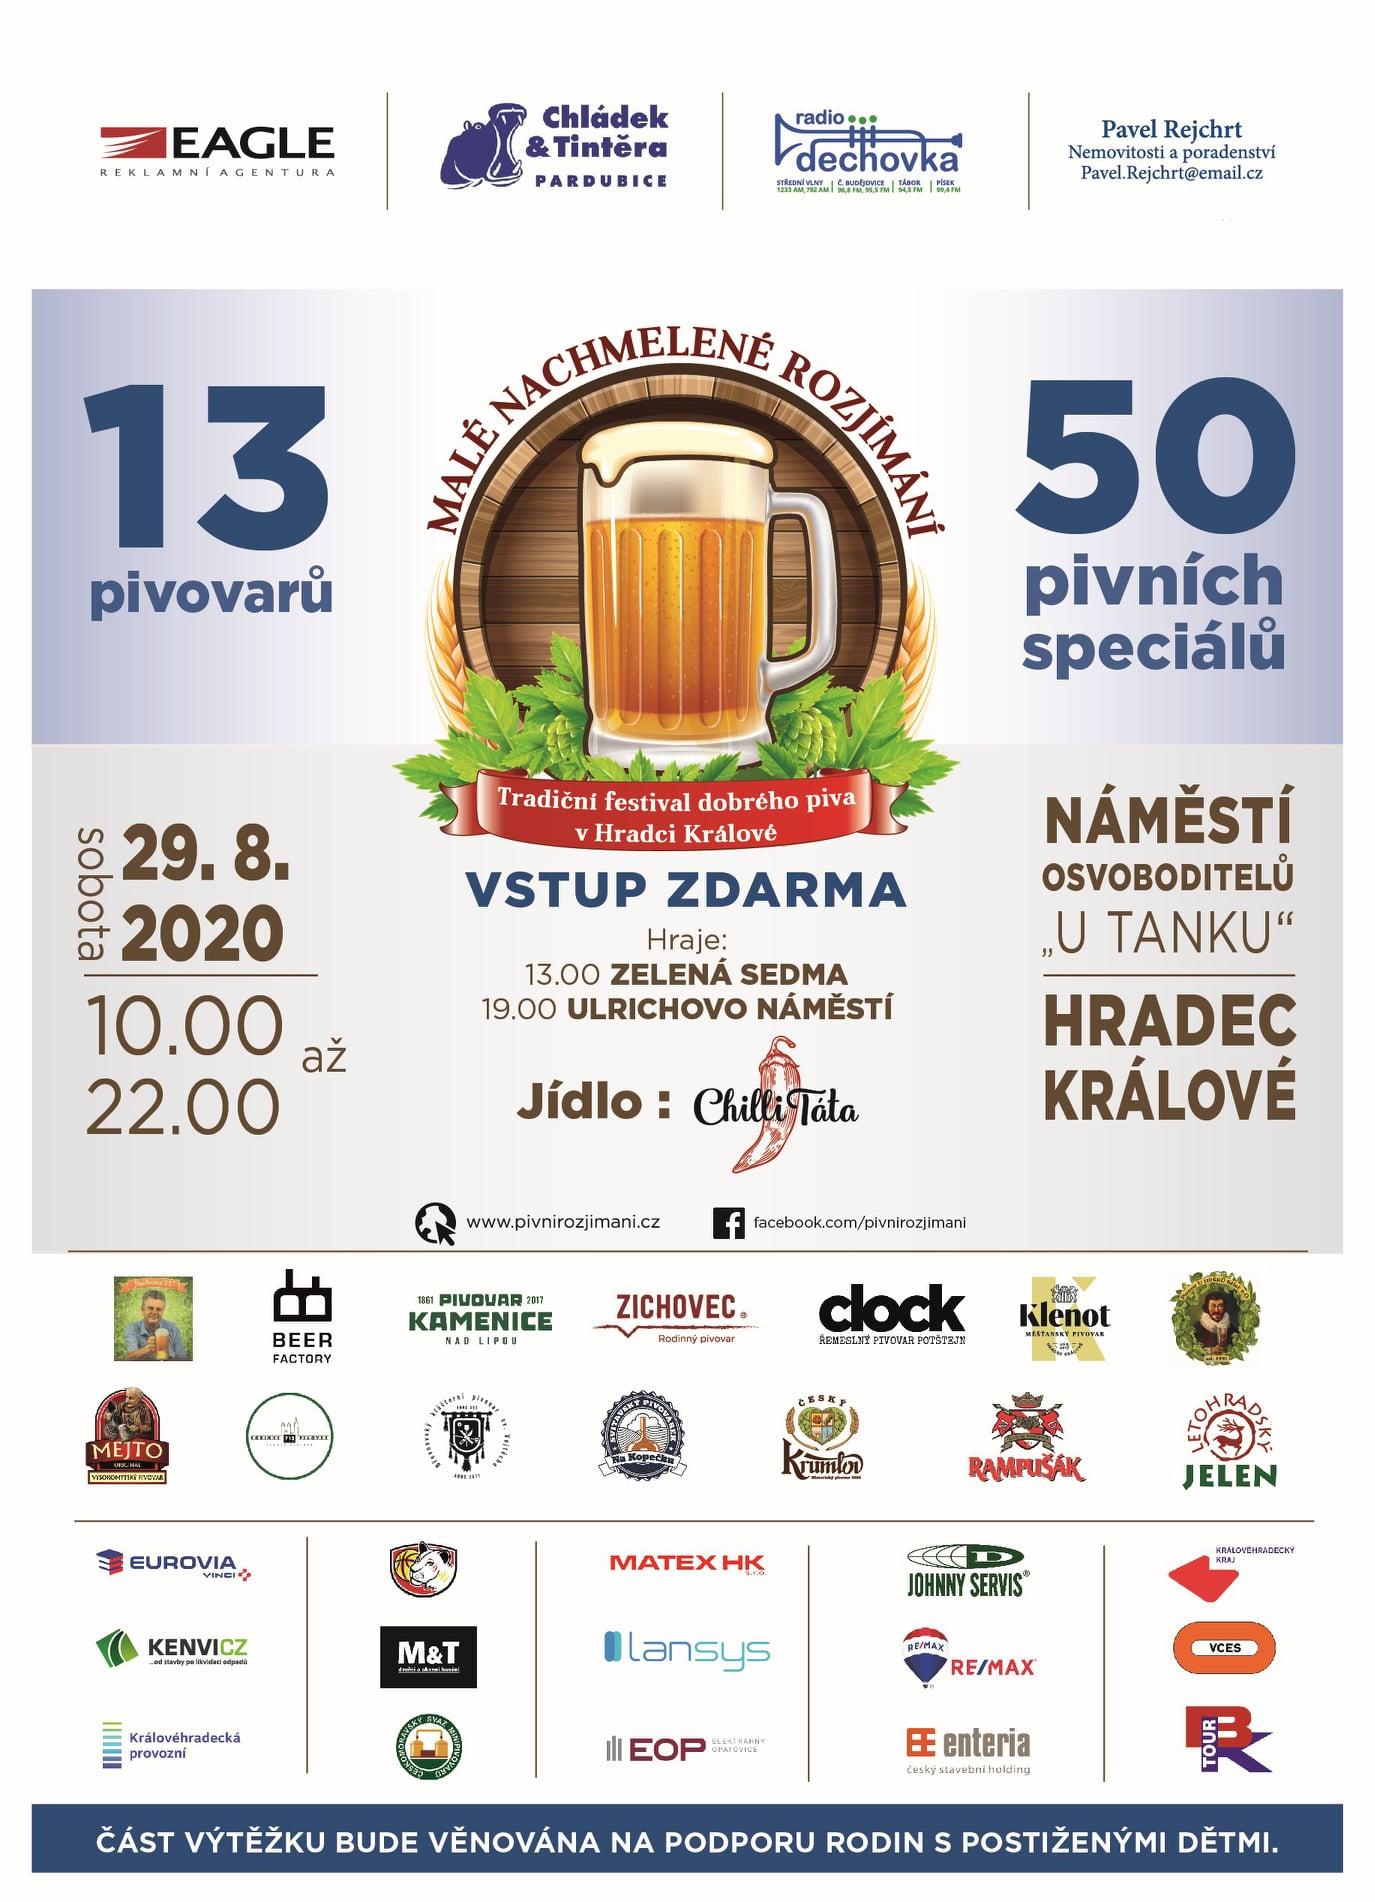 pivovary-pivni-akce-male-nachmelene-rozjimani-hradec-kralove-2020